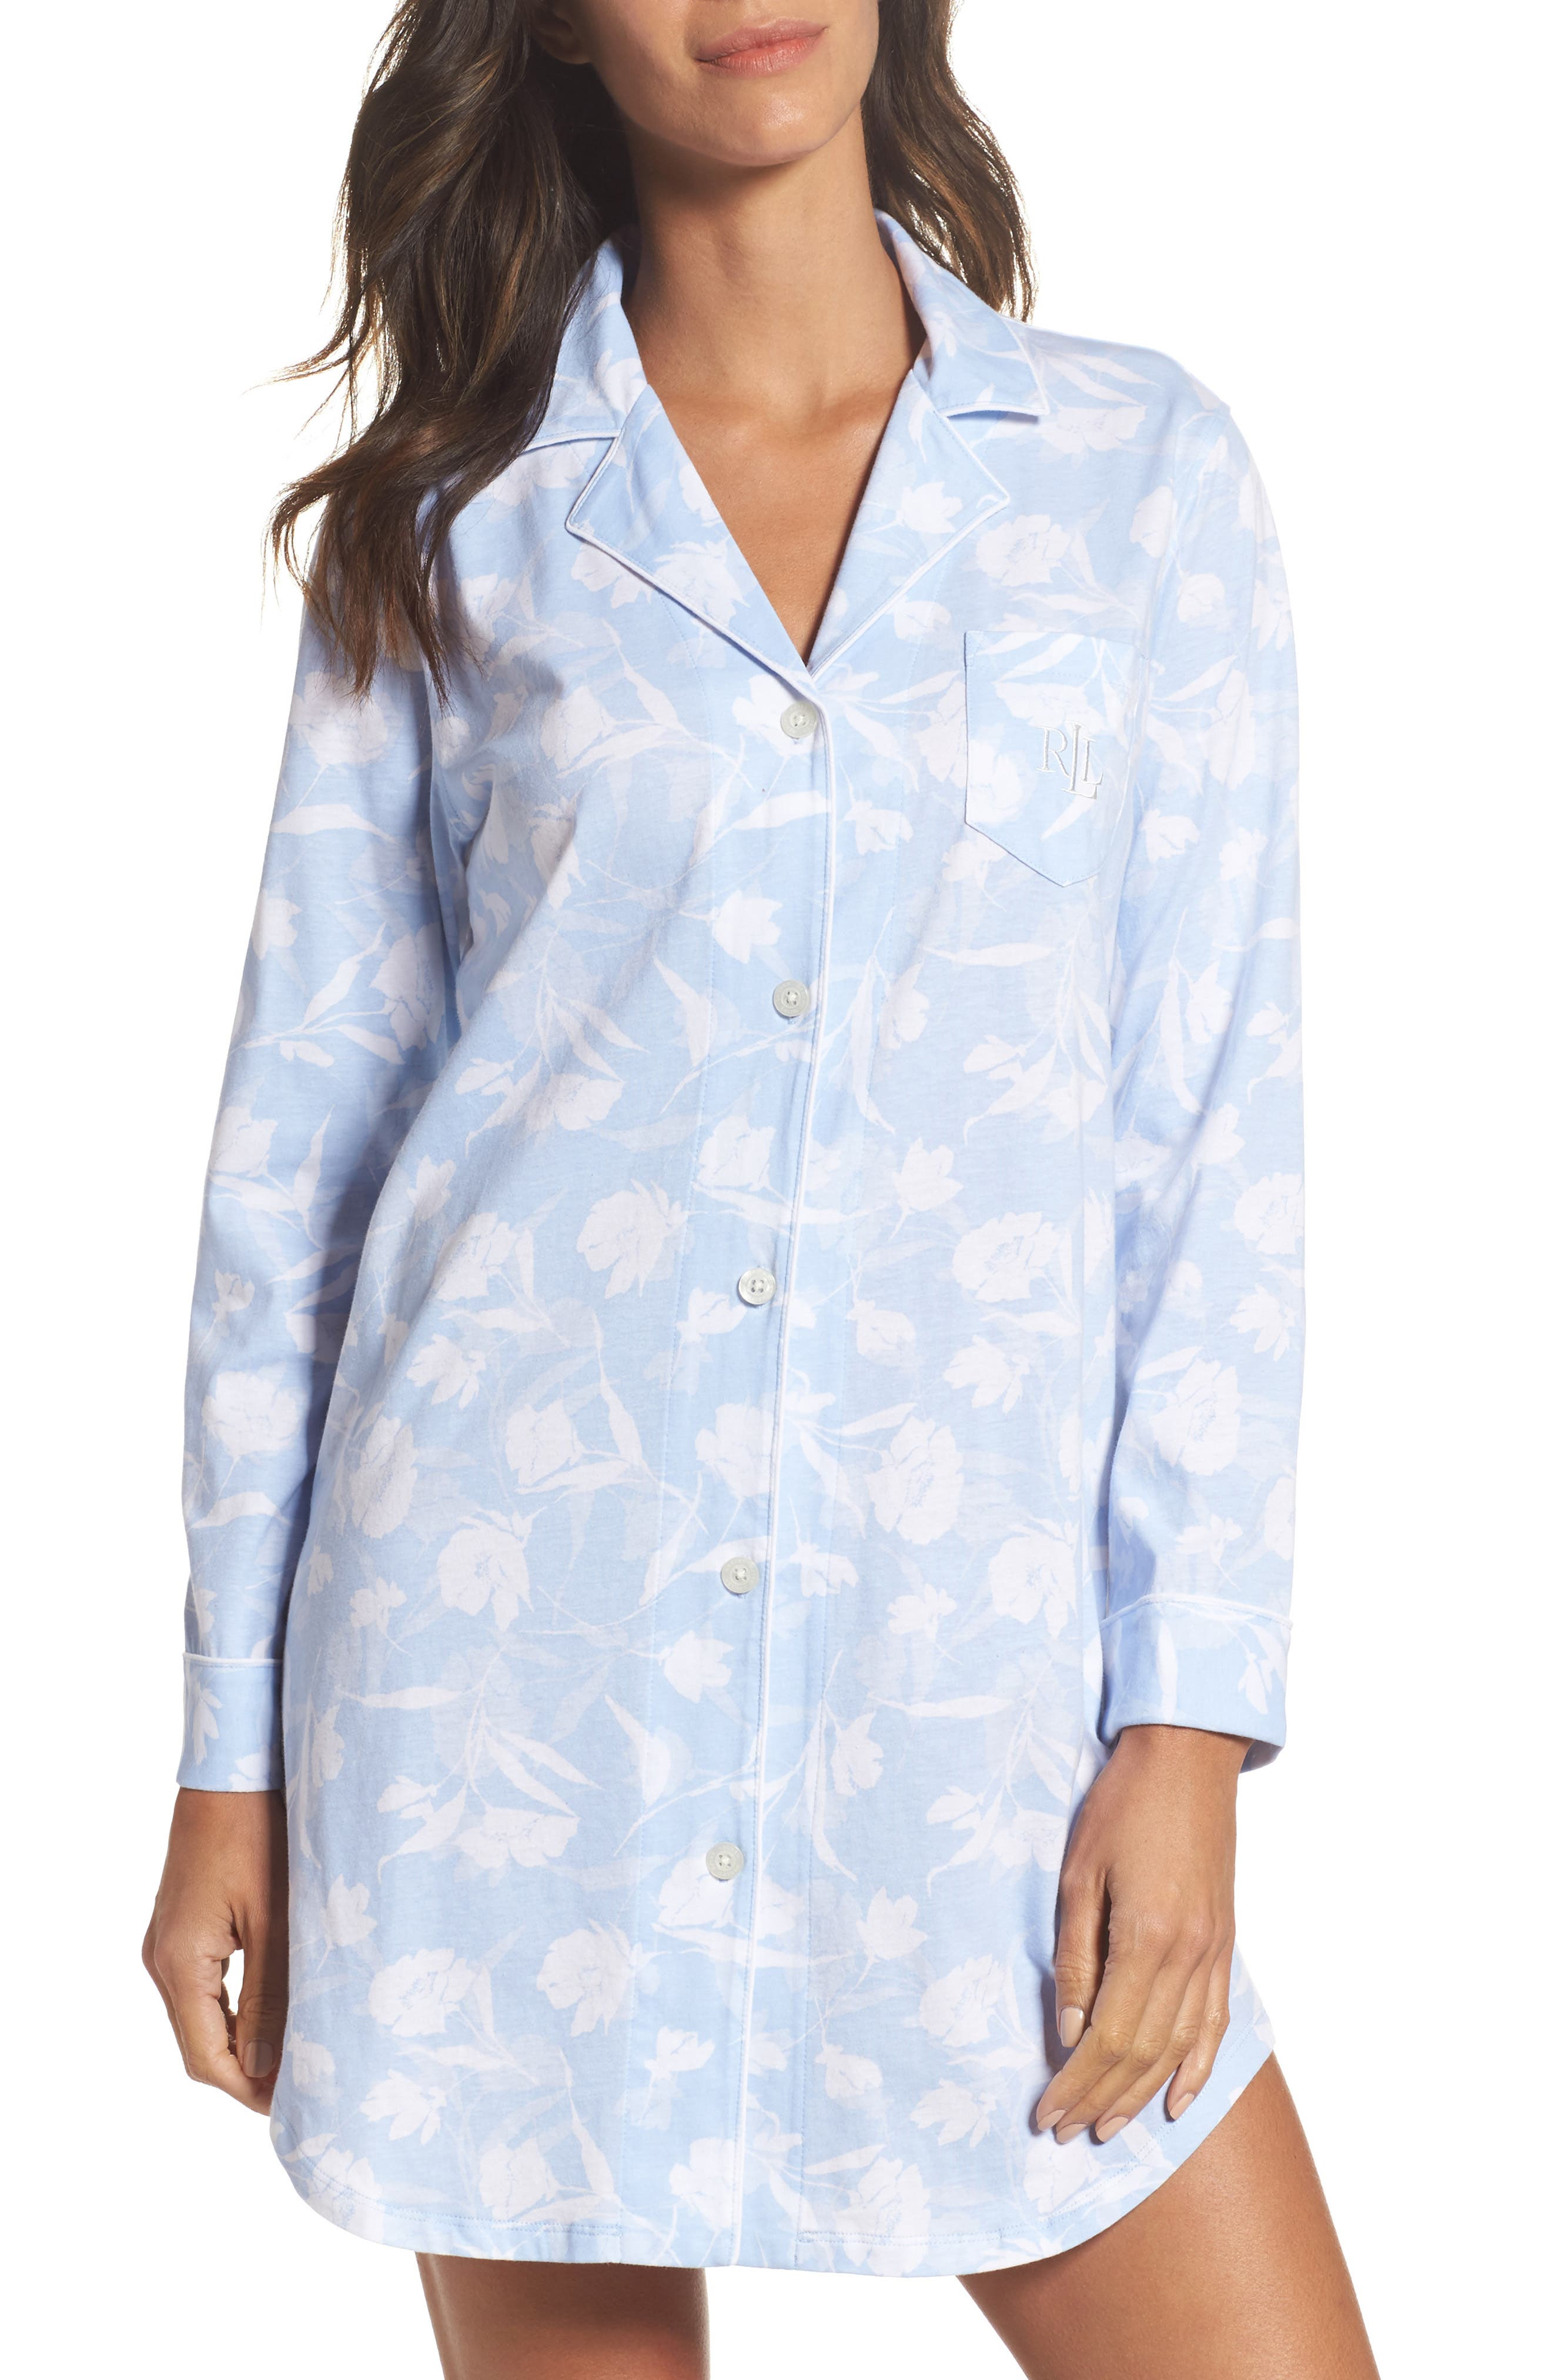 Notch Collar Sleep Shirt,                         Main,                         color, Pale Blue Monotone Floral